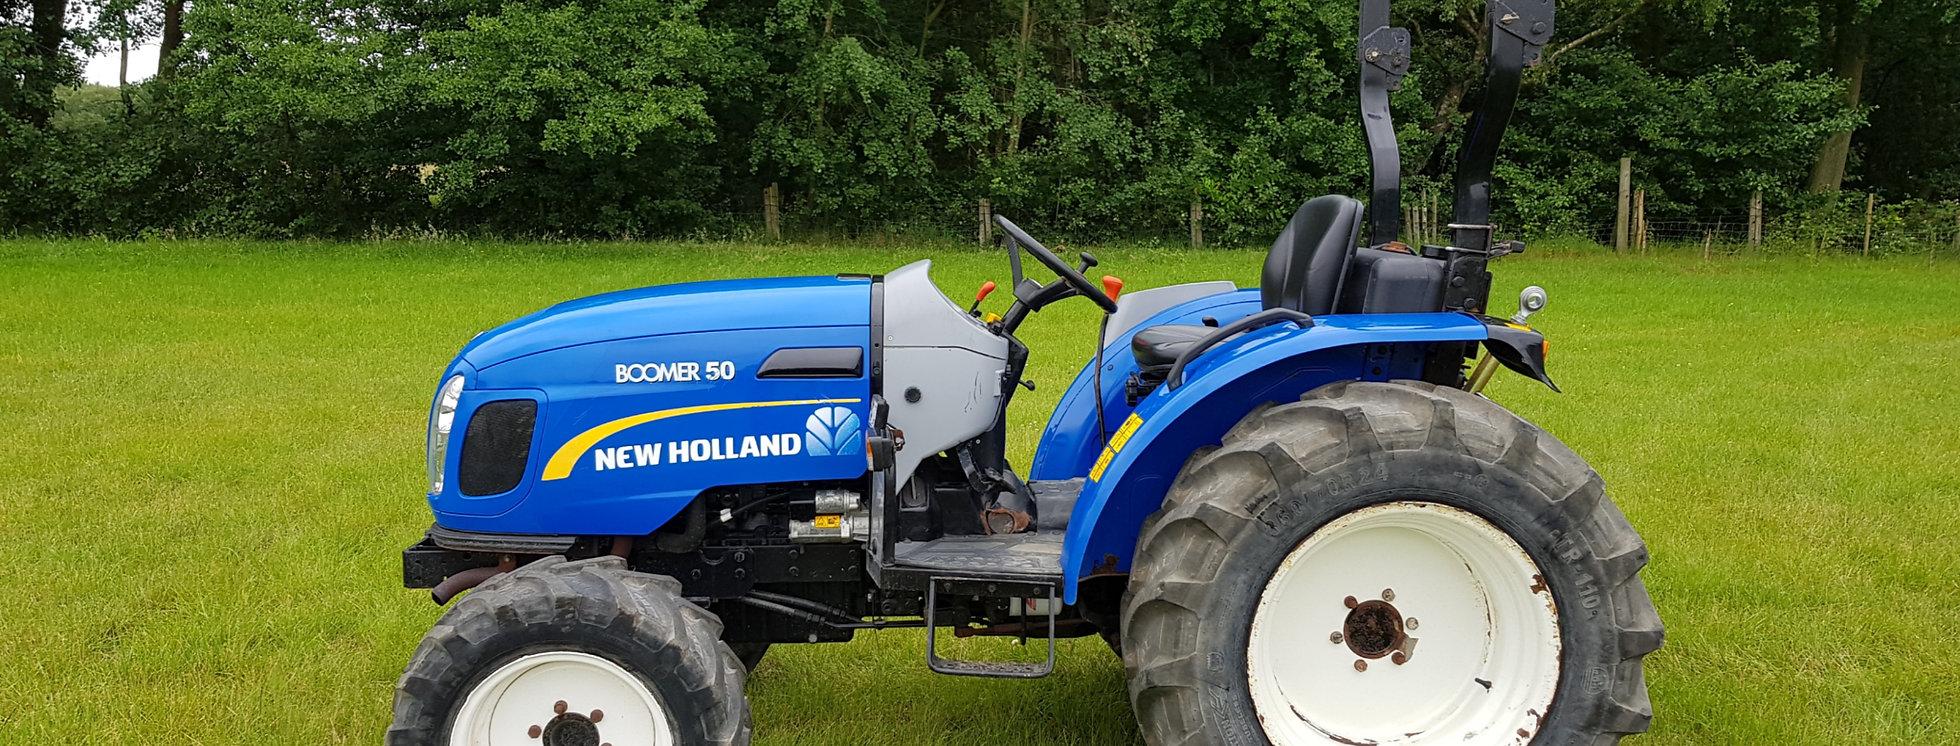 New Holland Hydrostatic Transmission Problems